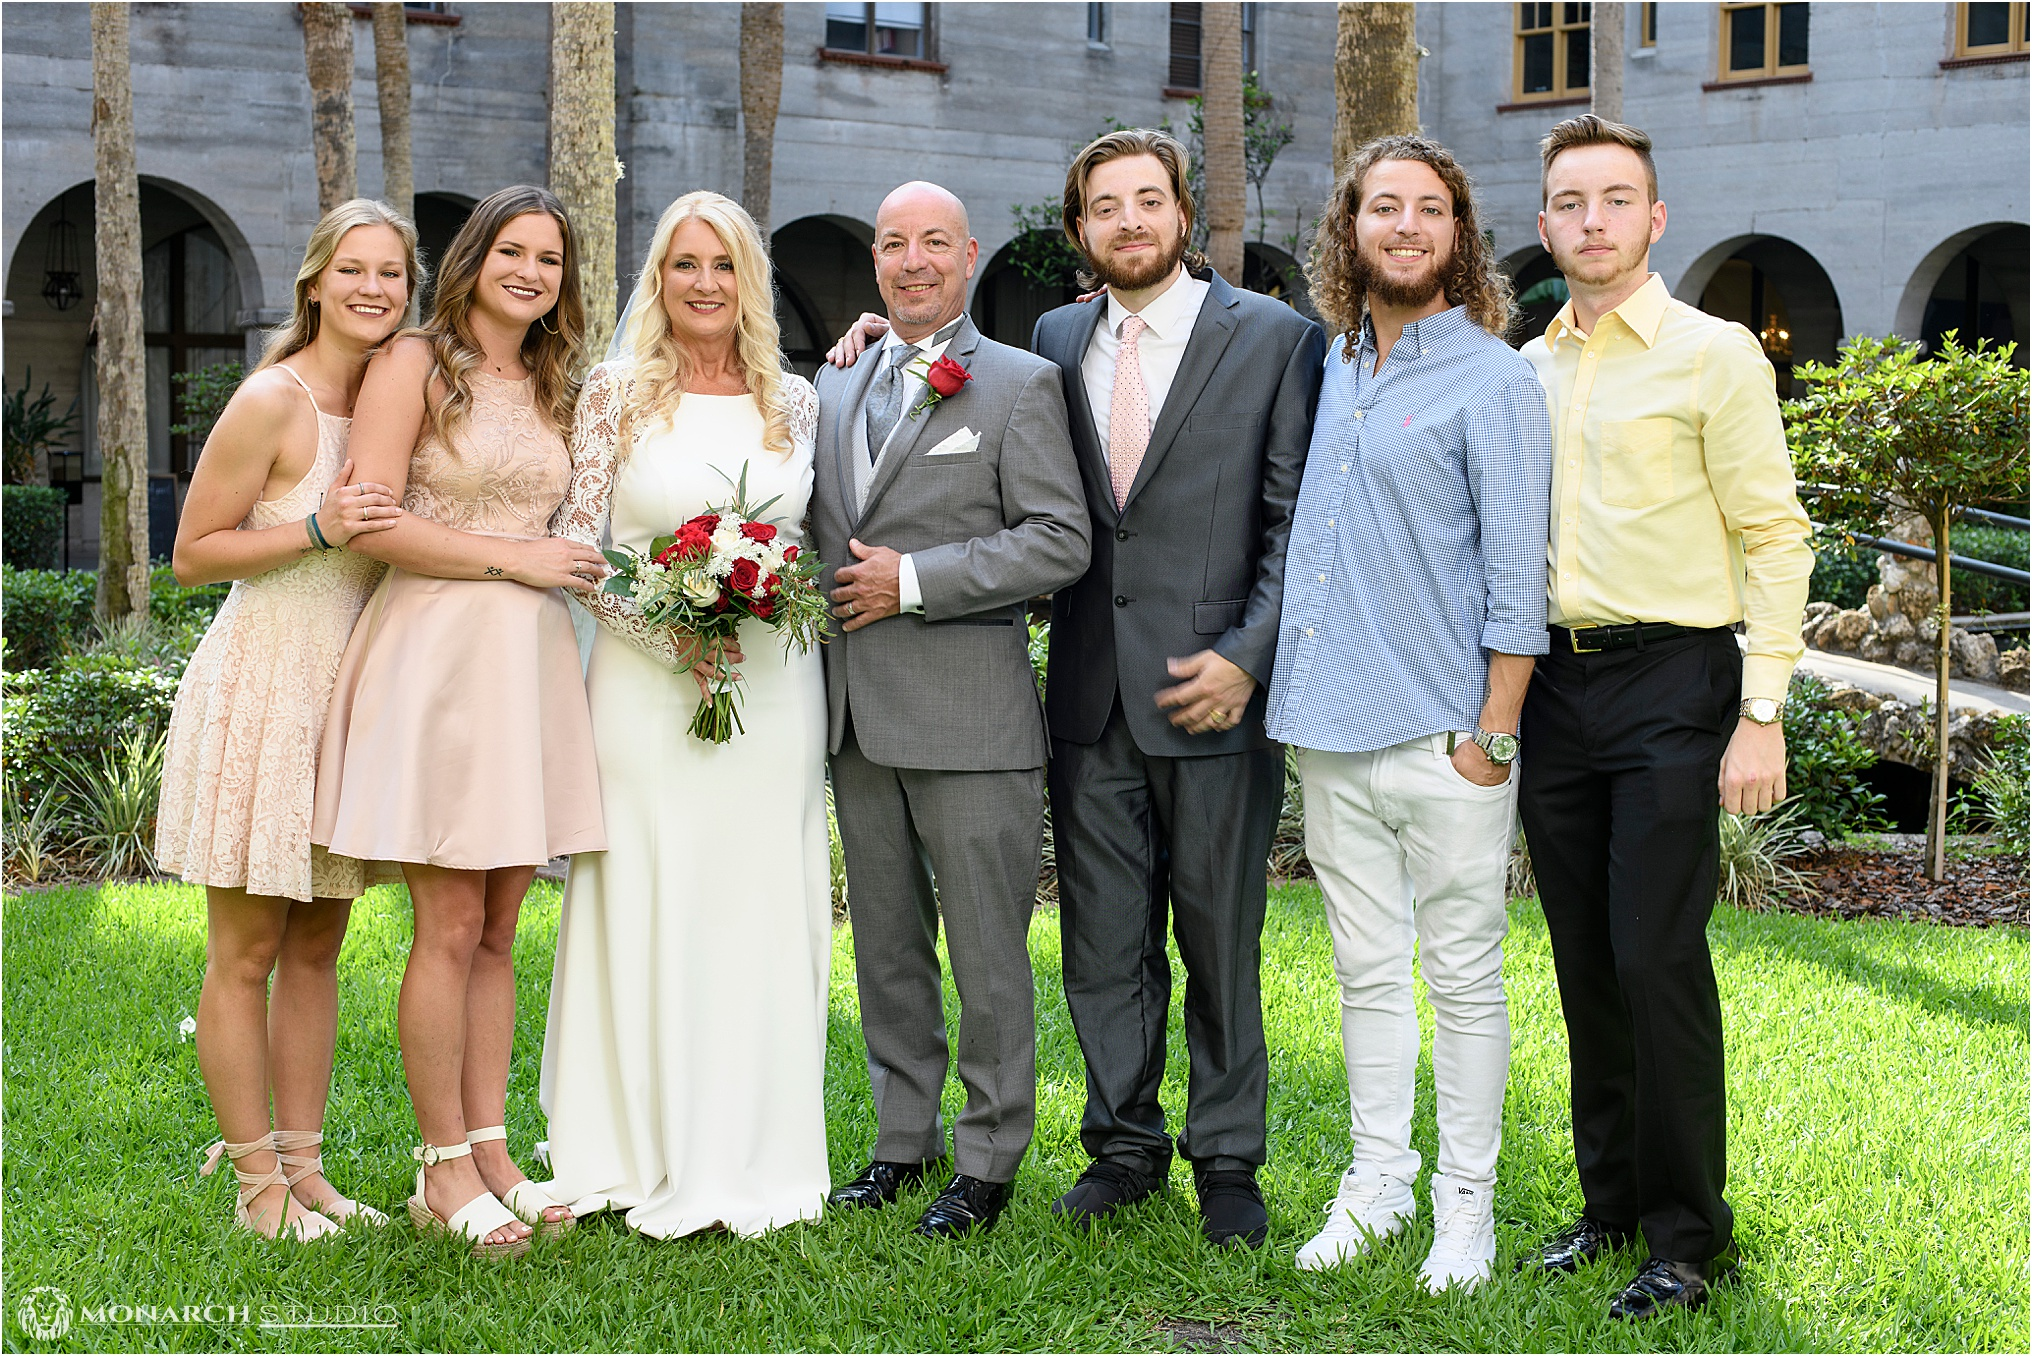 june-2019-saint-augustine-wedding-024.jpg